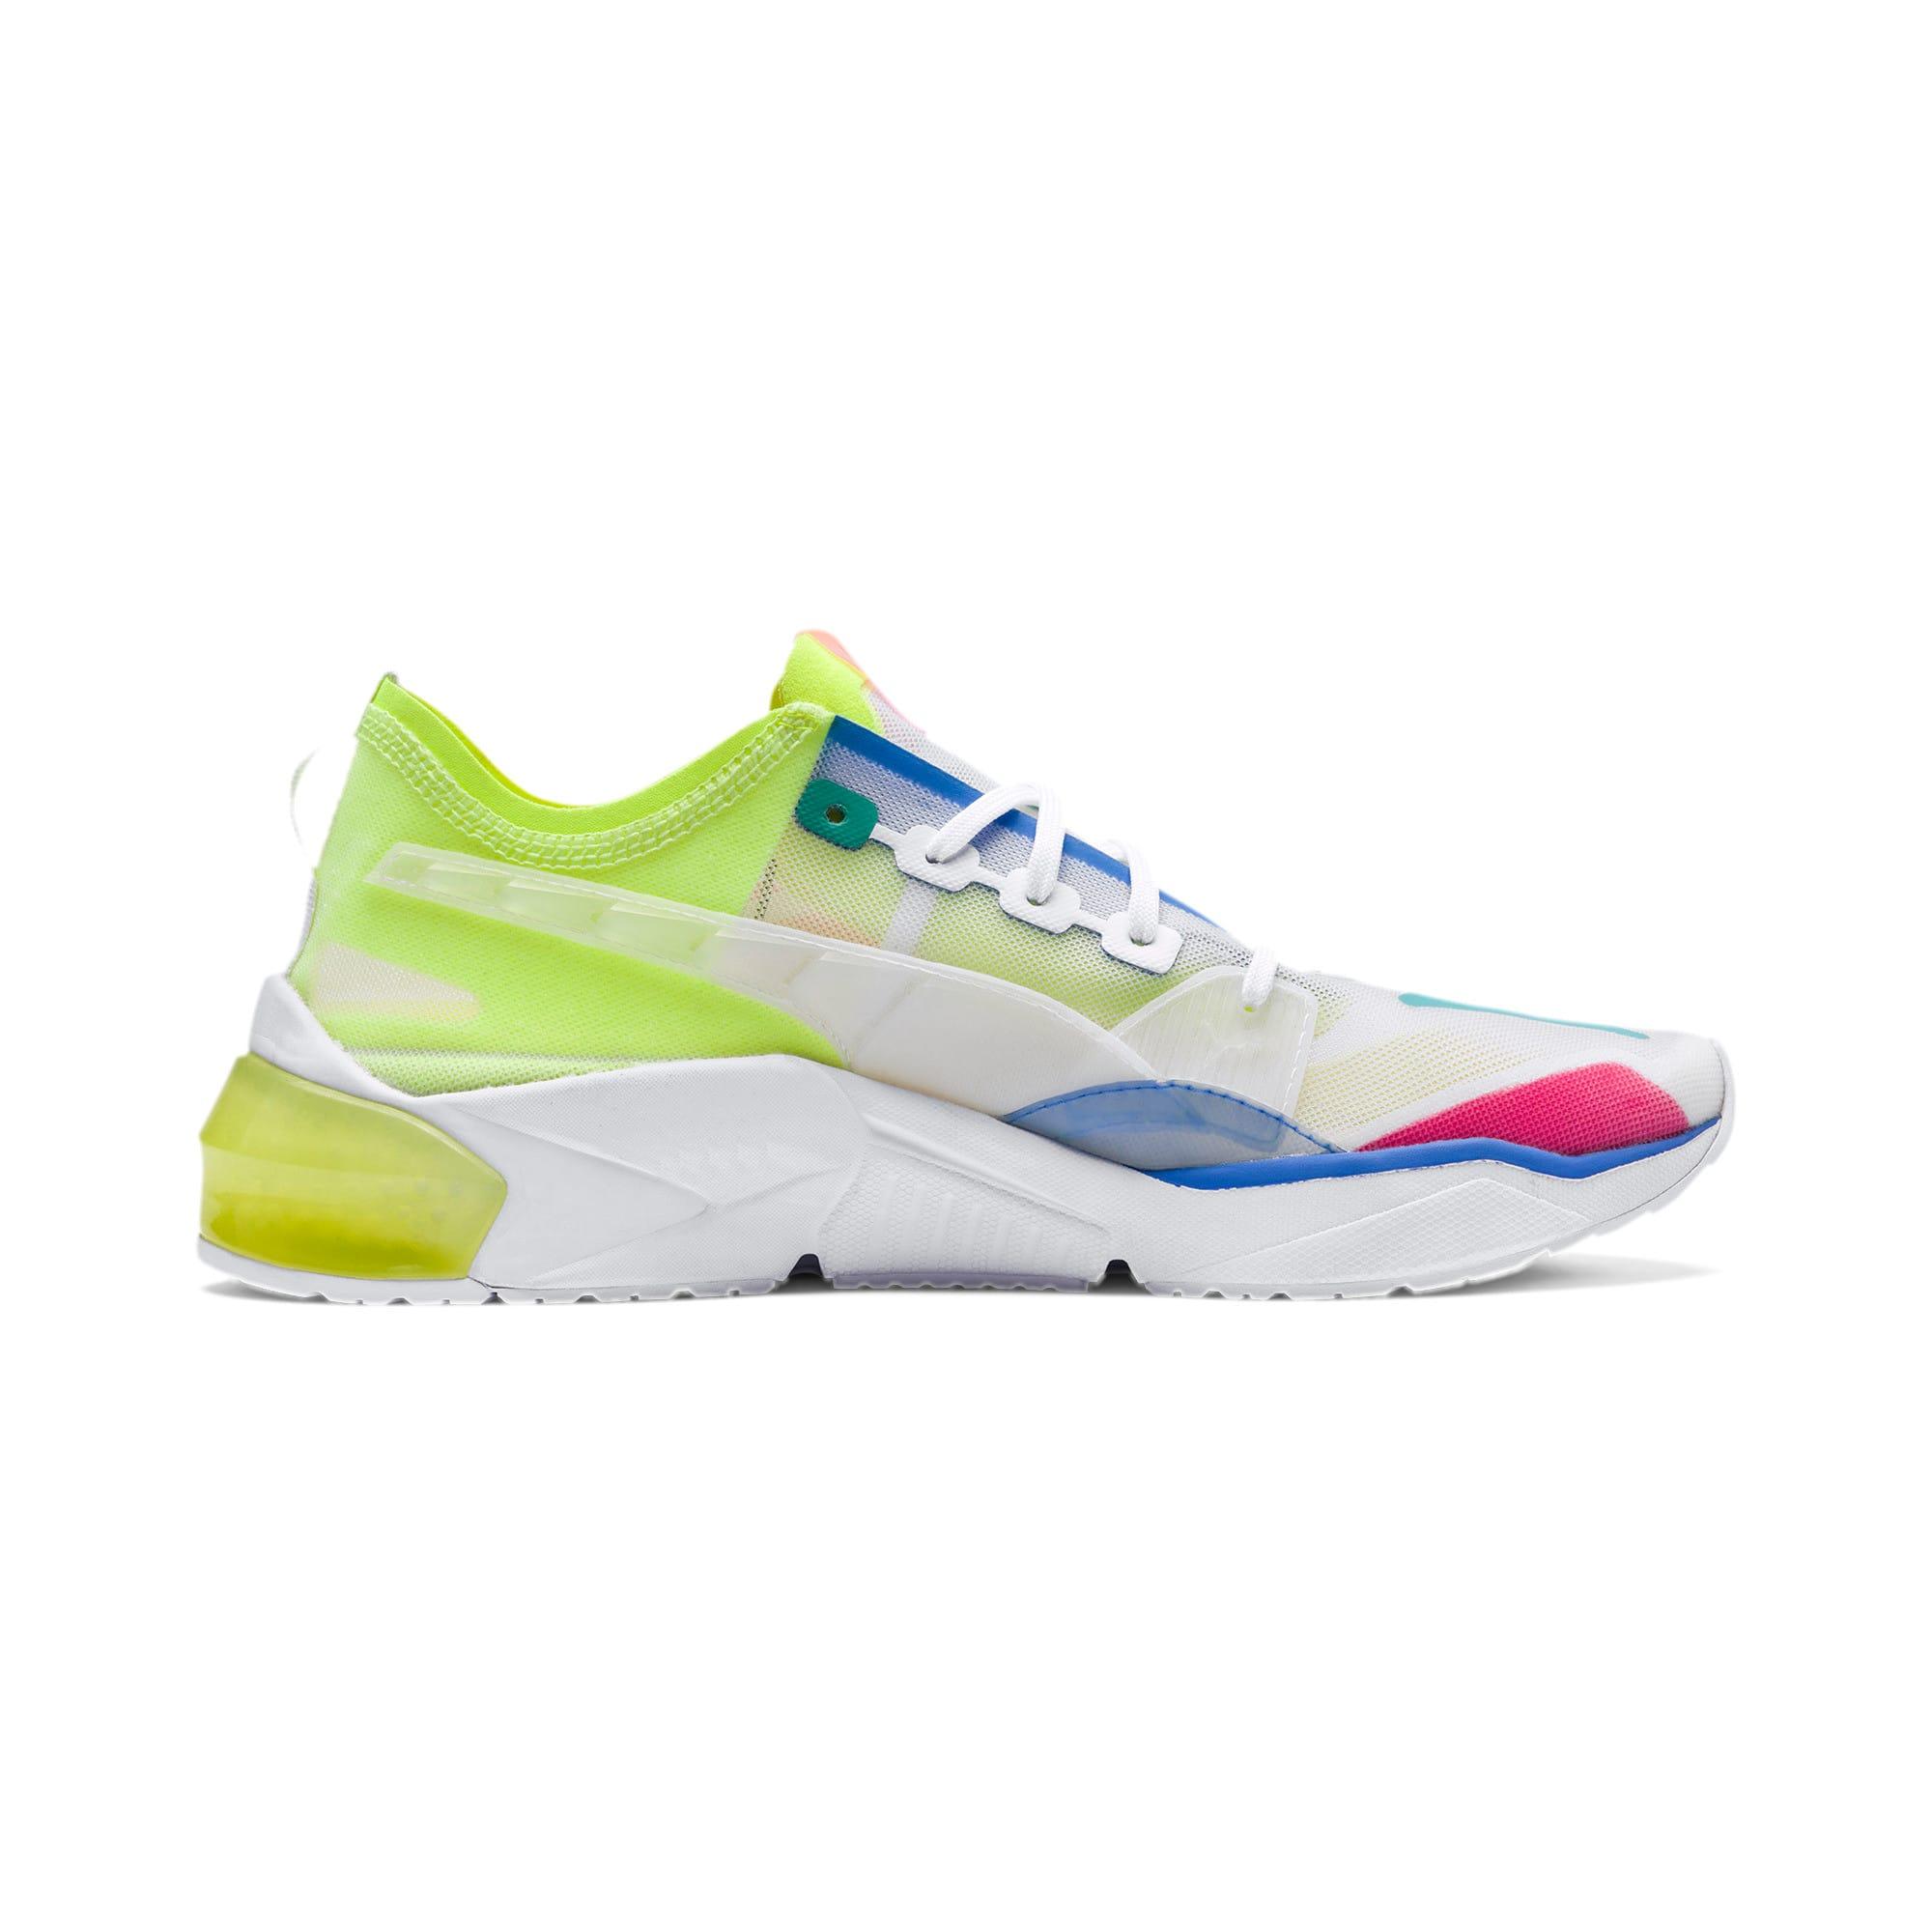 Thumbnail 6 of LQDCELL Optic Sheer Men's Training Shoes, Puma White, medium